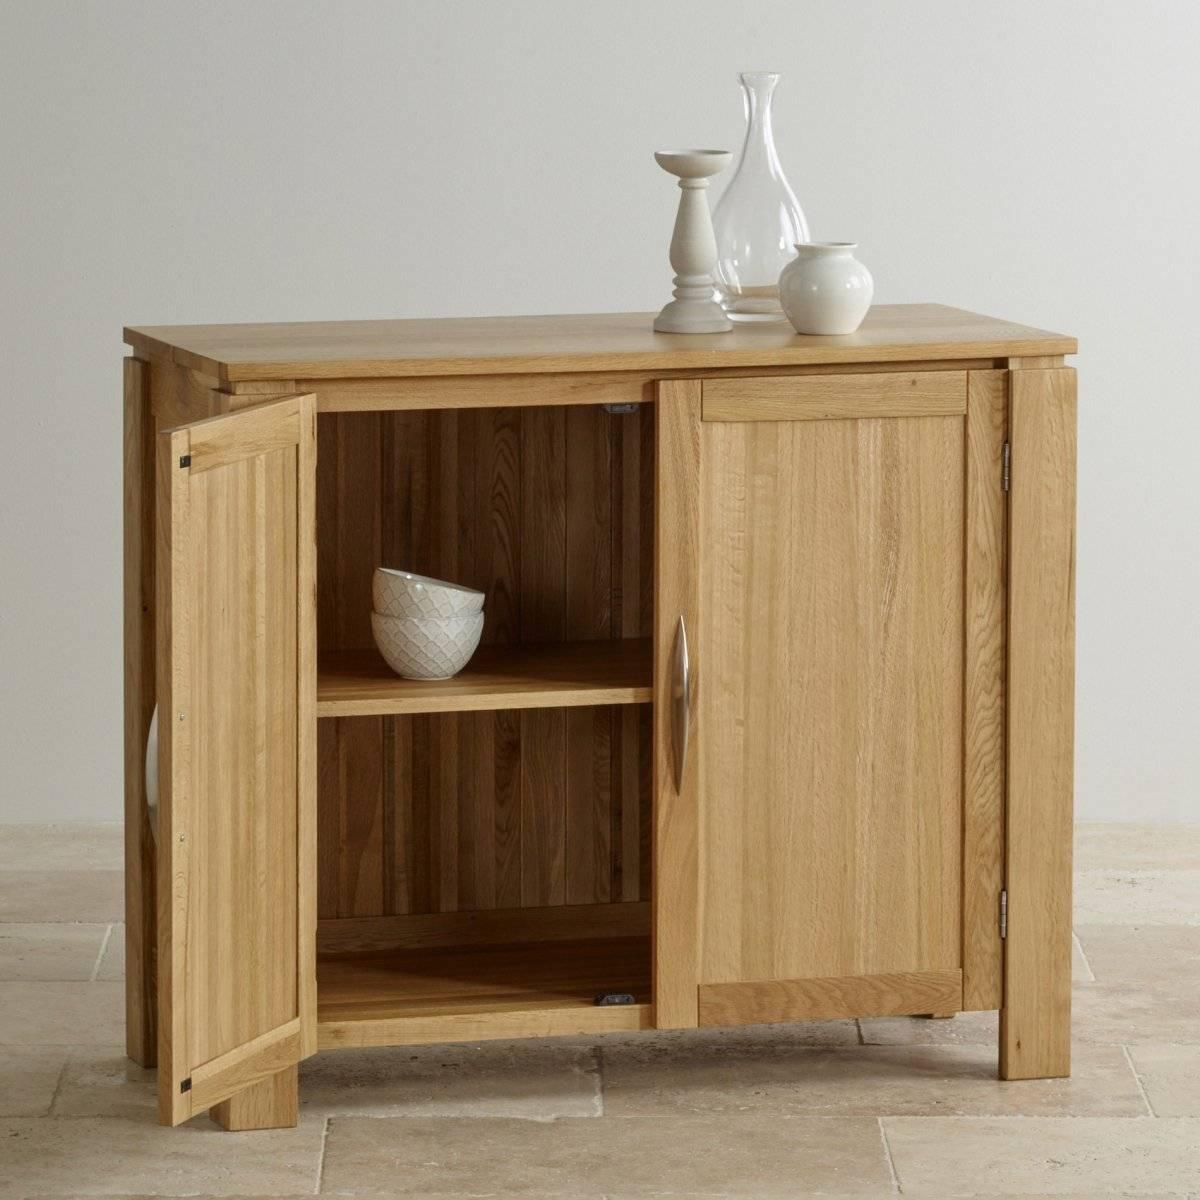 Galway Small Sideboard In Natural Solid Oak | Oak Furniture Land Regarding Narrow Oak Sideboard (#10 of 20)